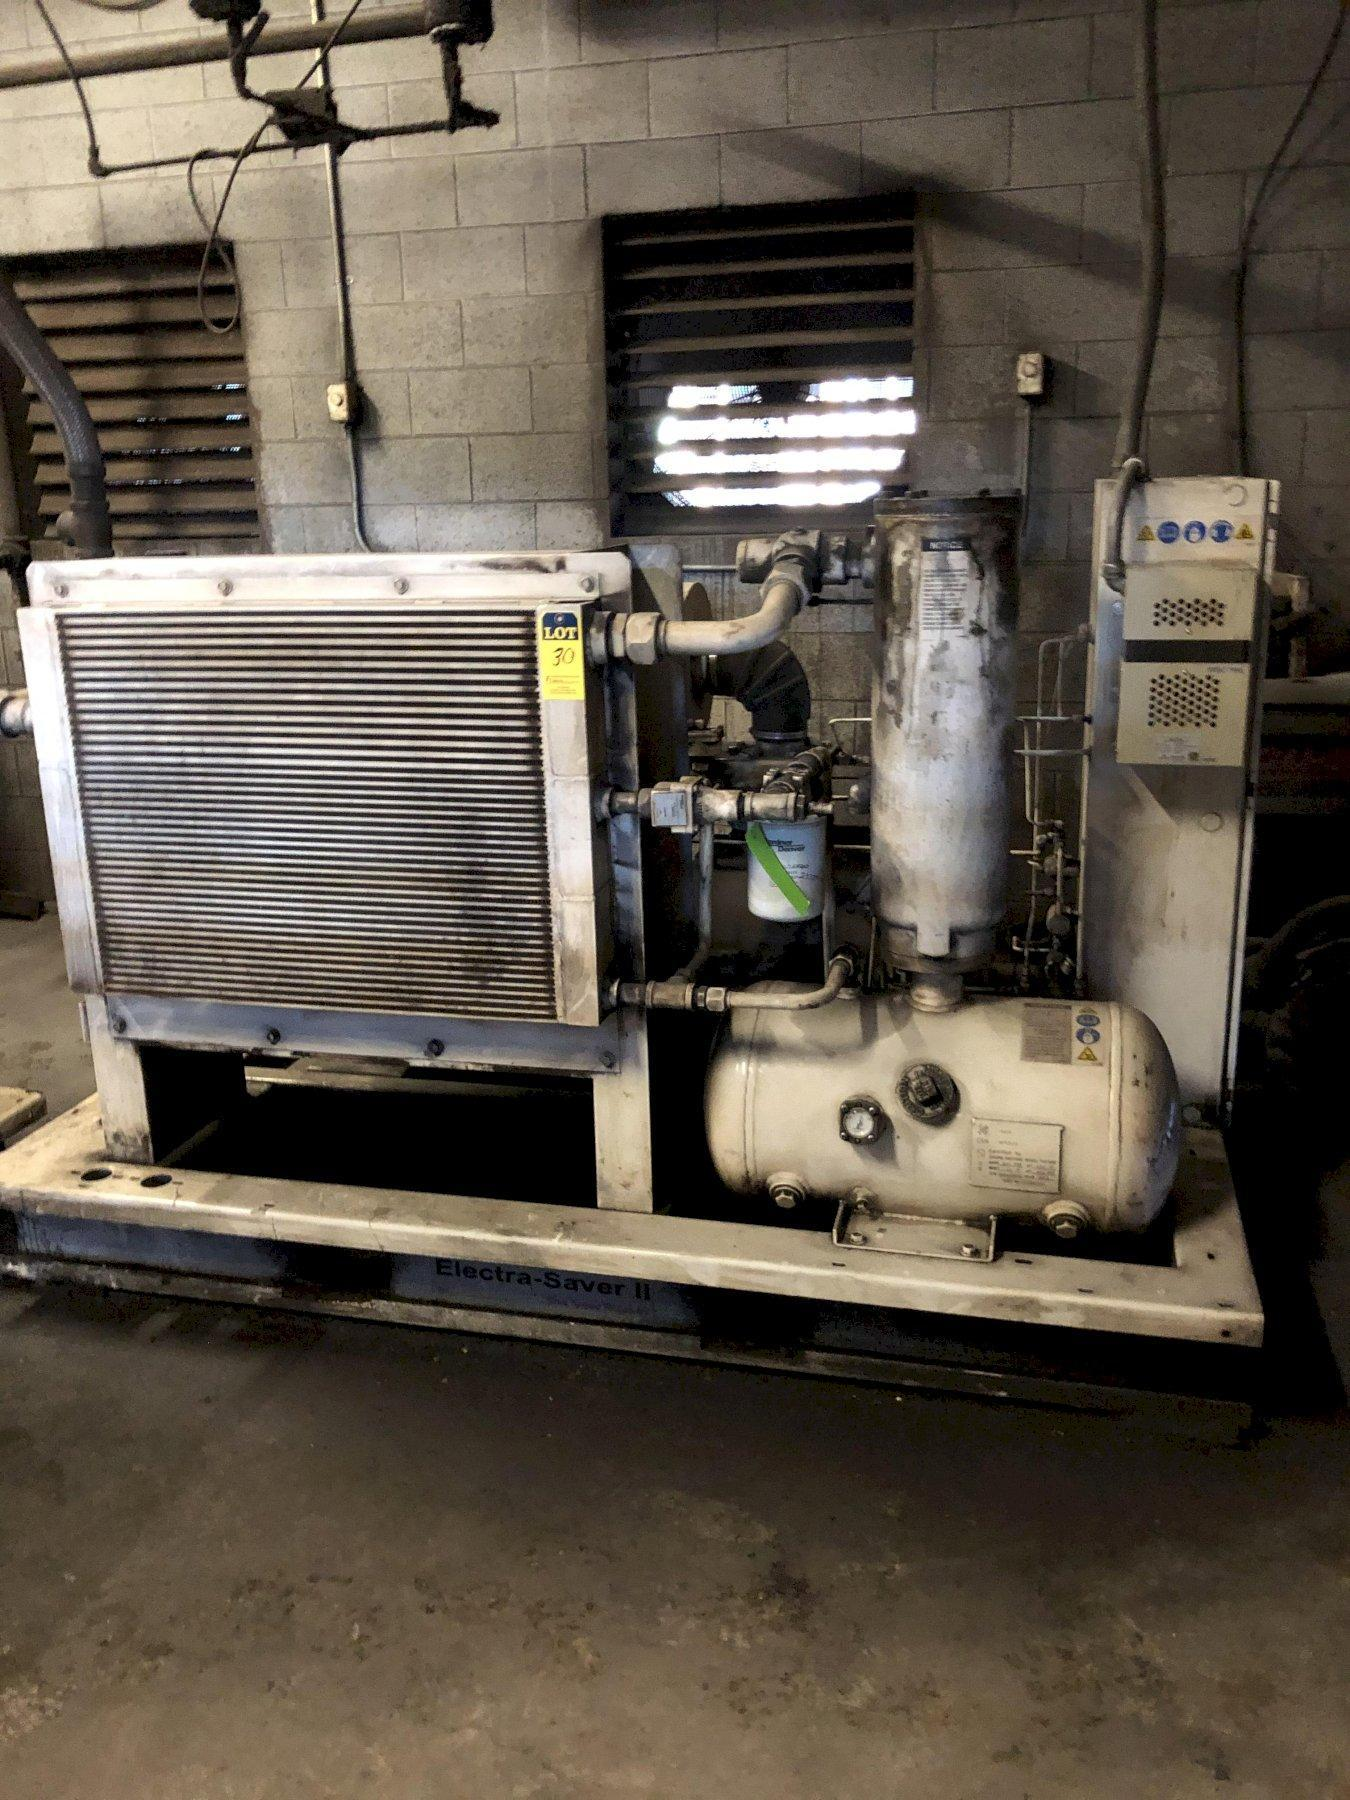 2010 Gardner Denver model ebm99k06 screw type air compressor s/n s323724, 45,885 hours, 75 hp